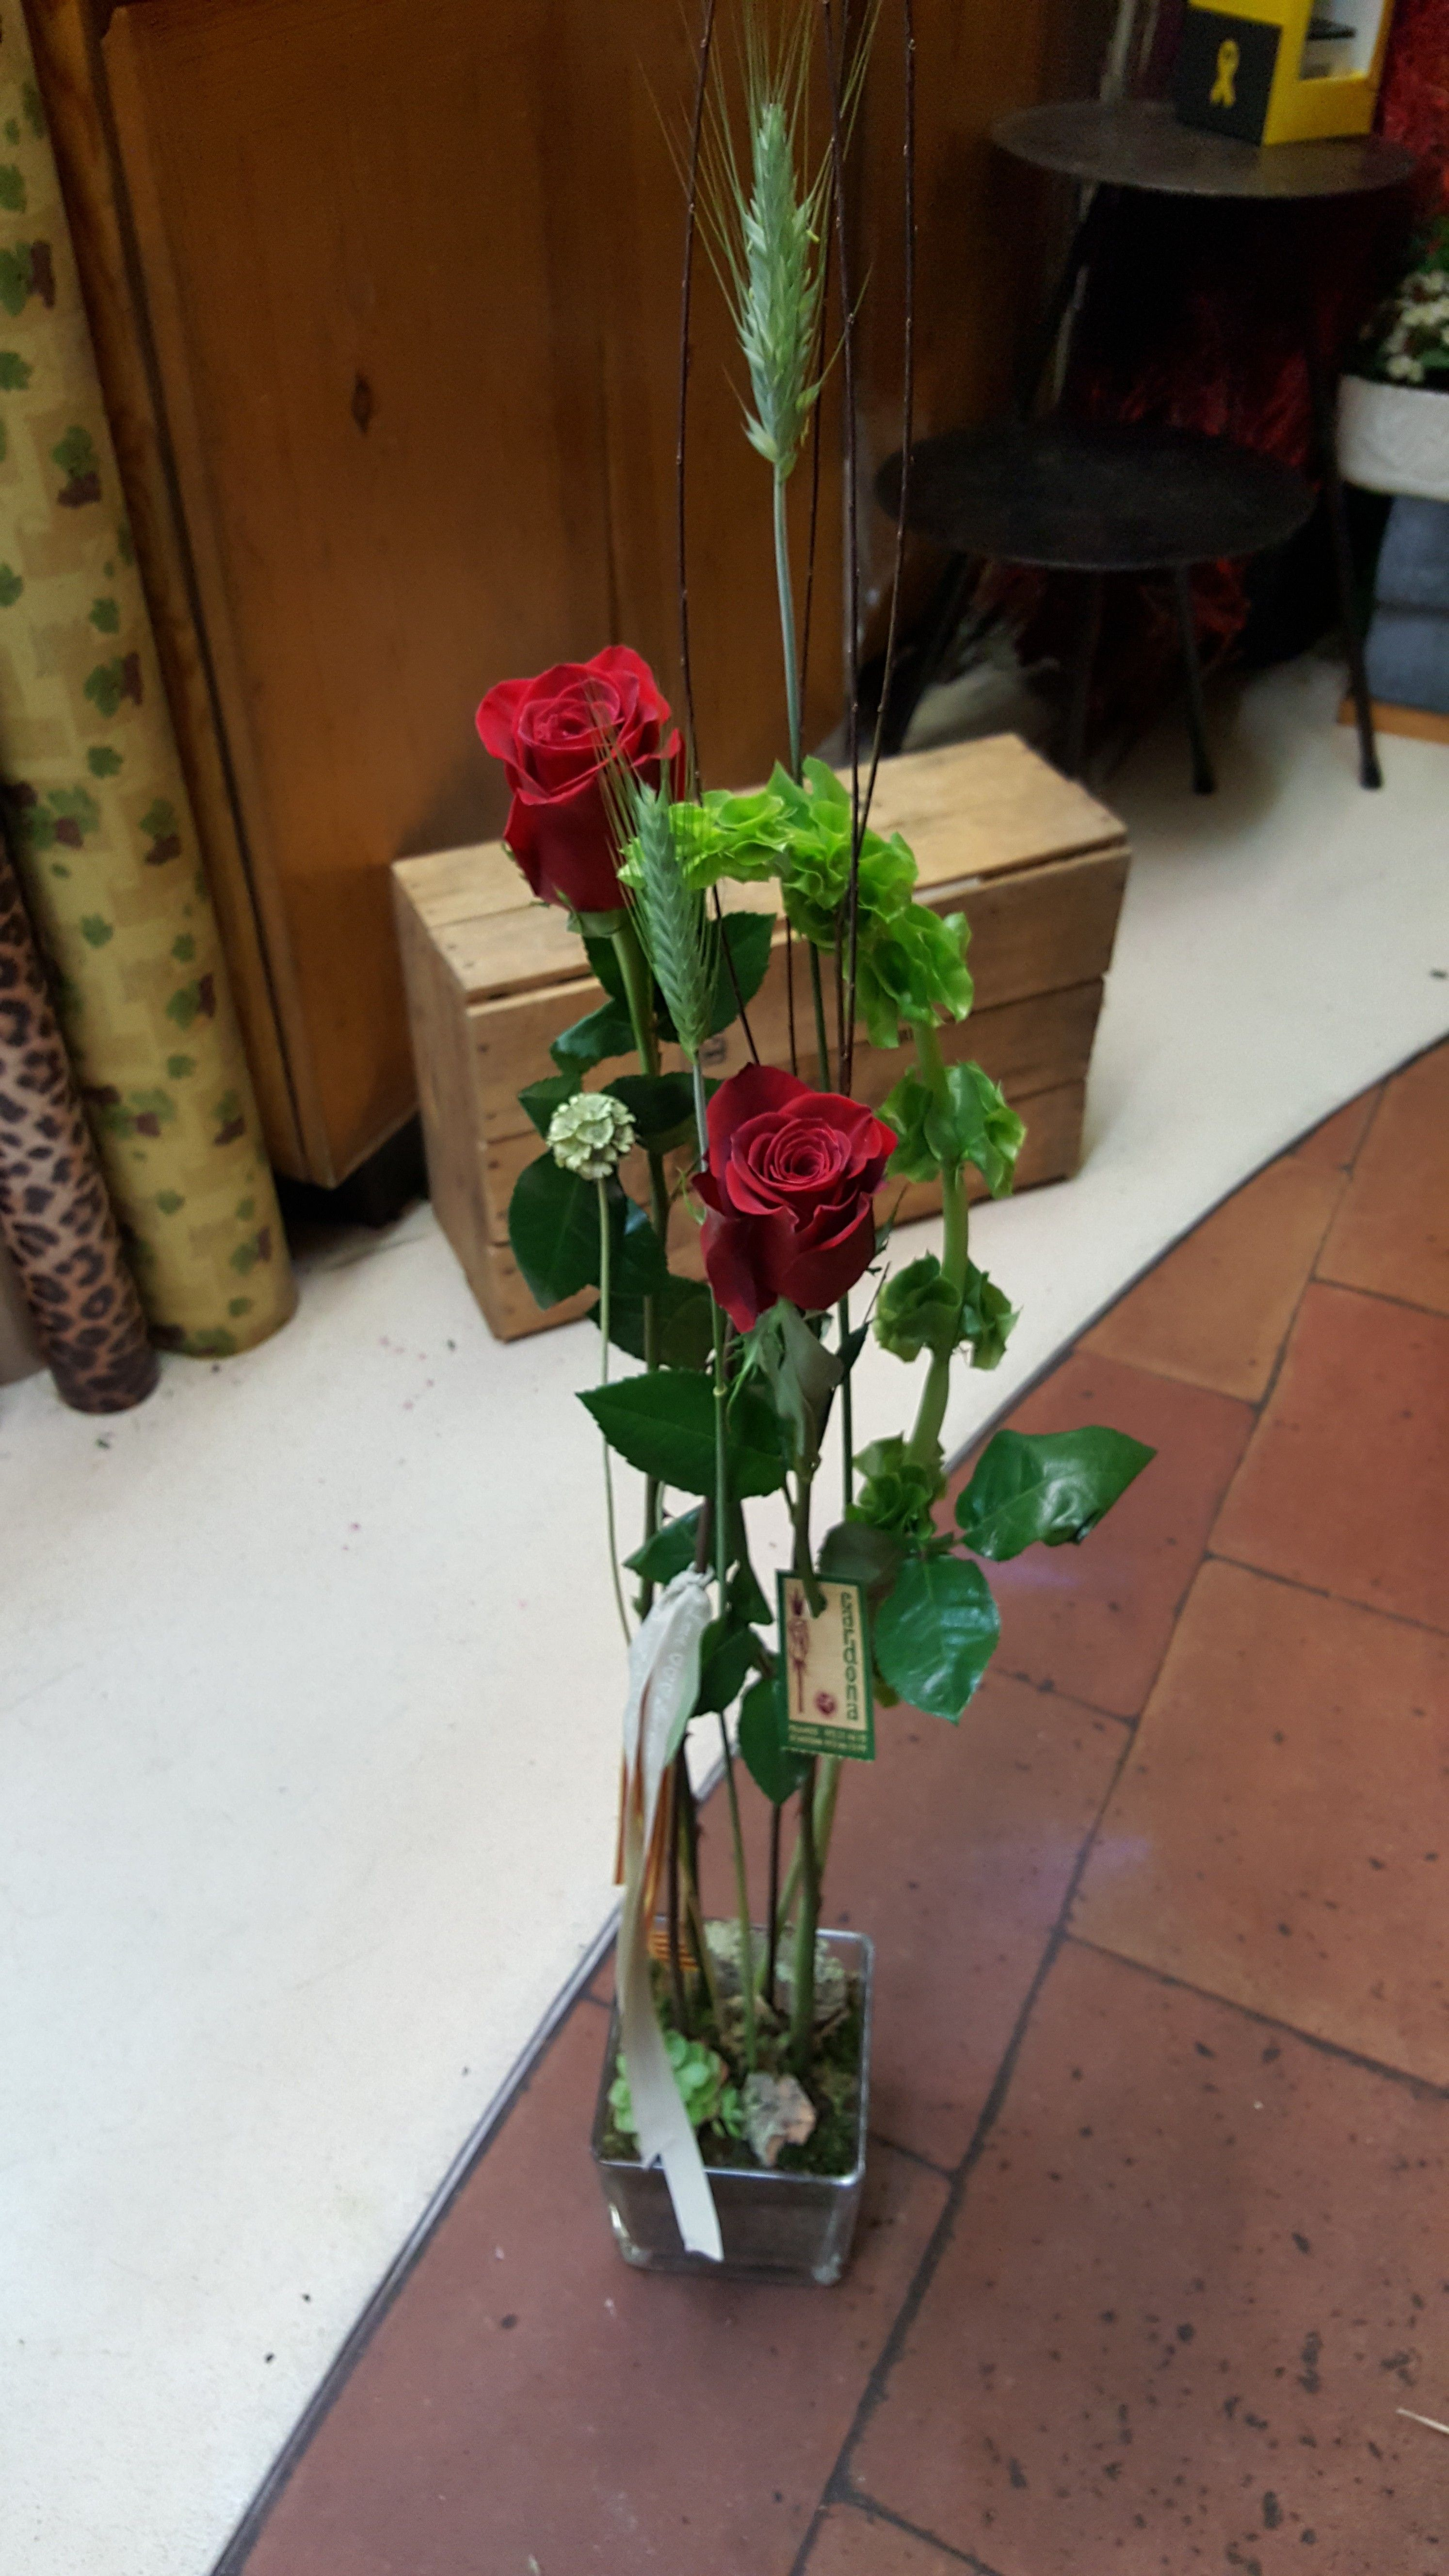 Foto 6 de Floristerías en Palamós | Cardona Flors i Plantes